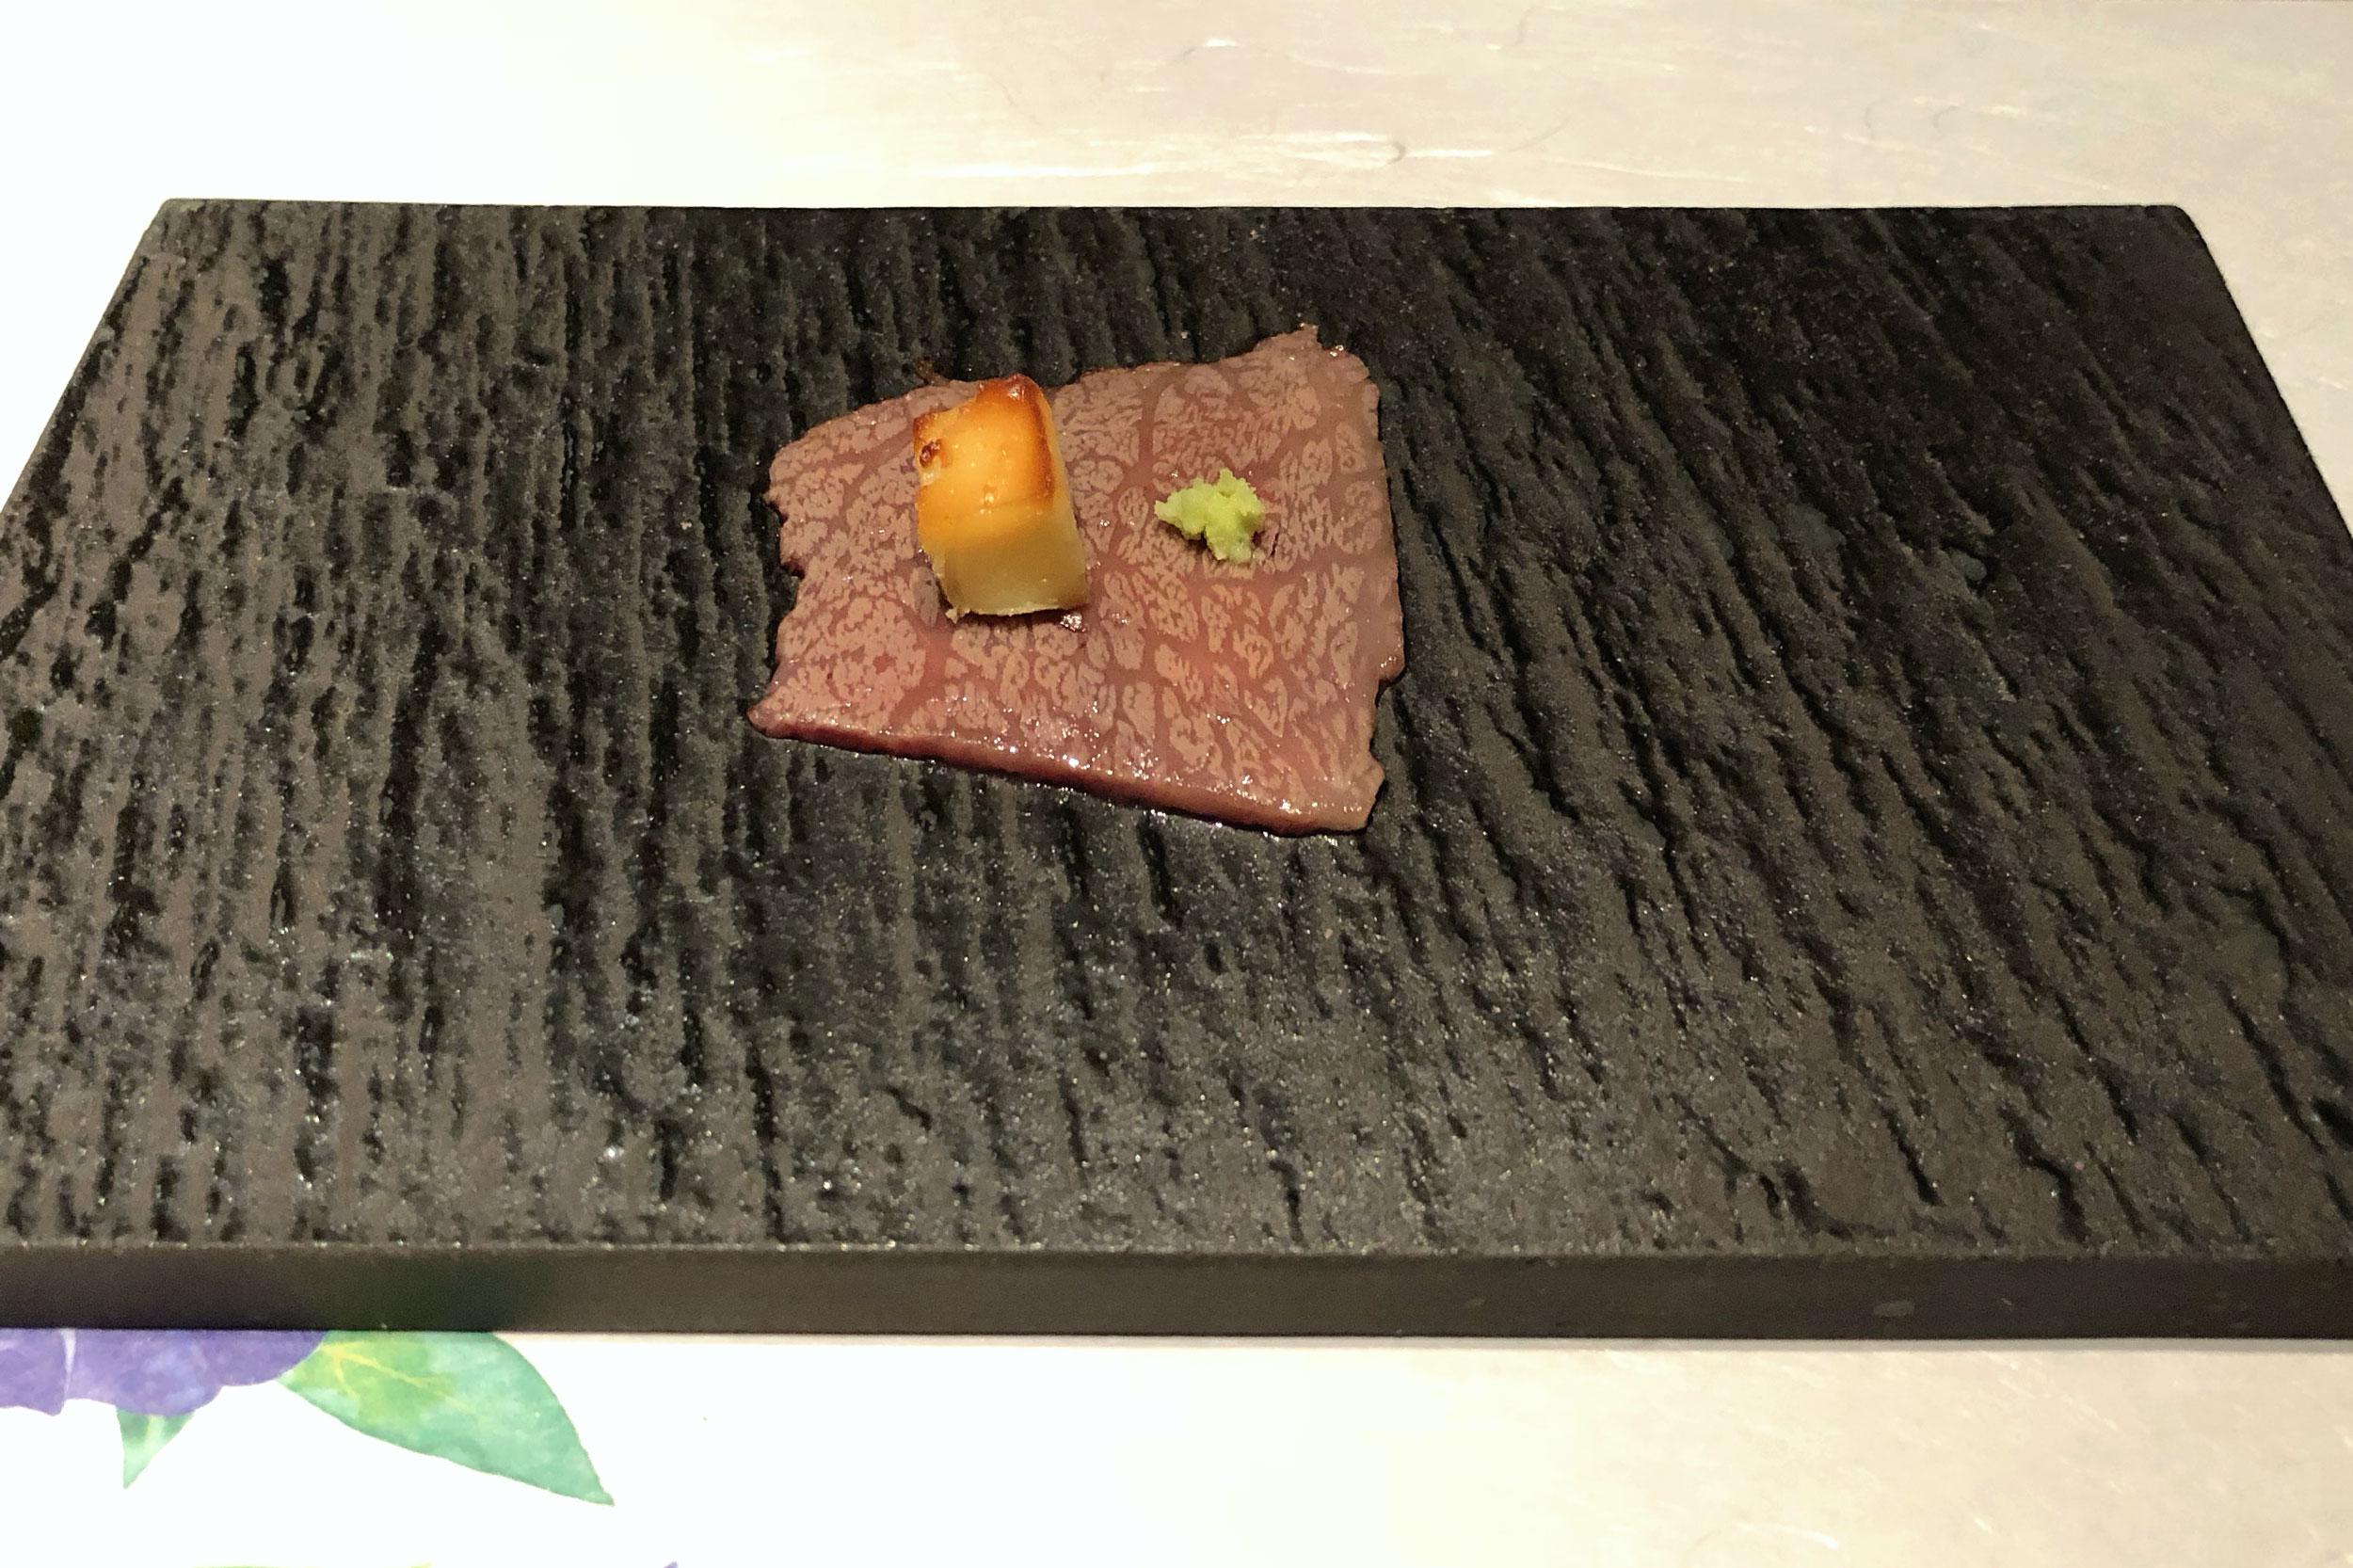 A5 Takanokuni Wagyu with miso pickled cream cheese and wasabi